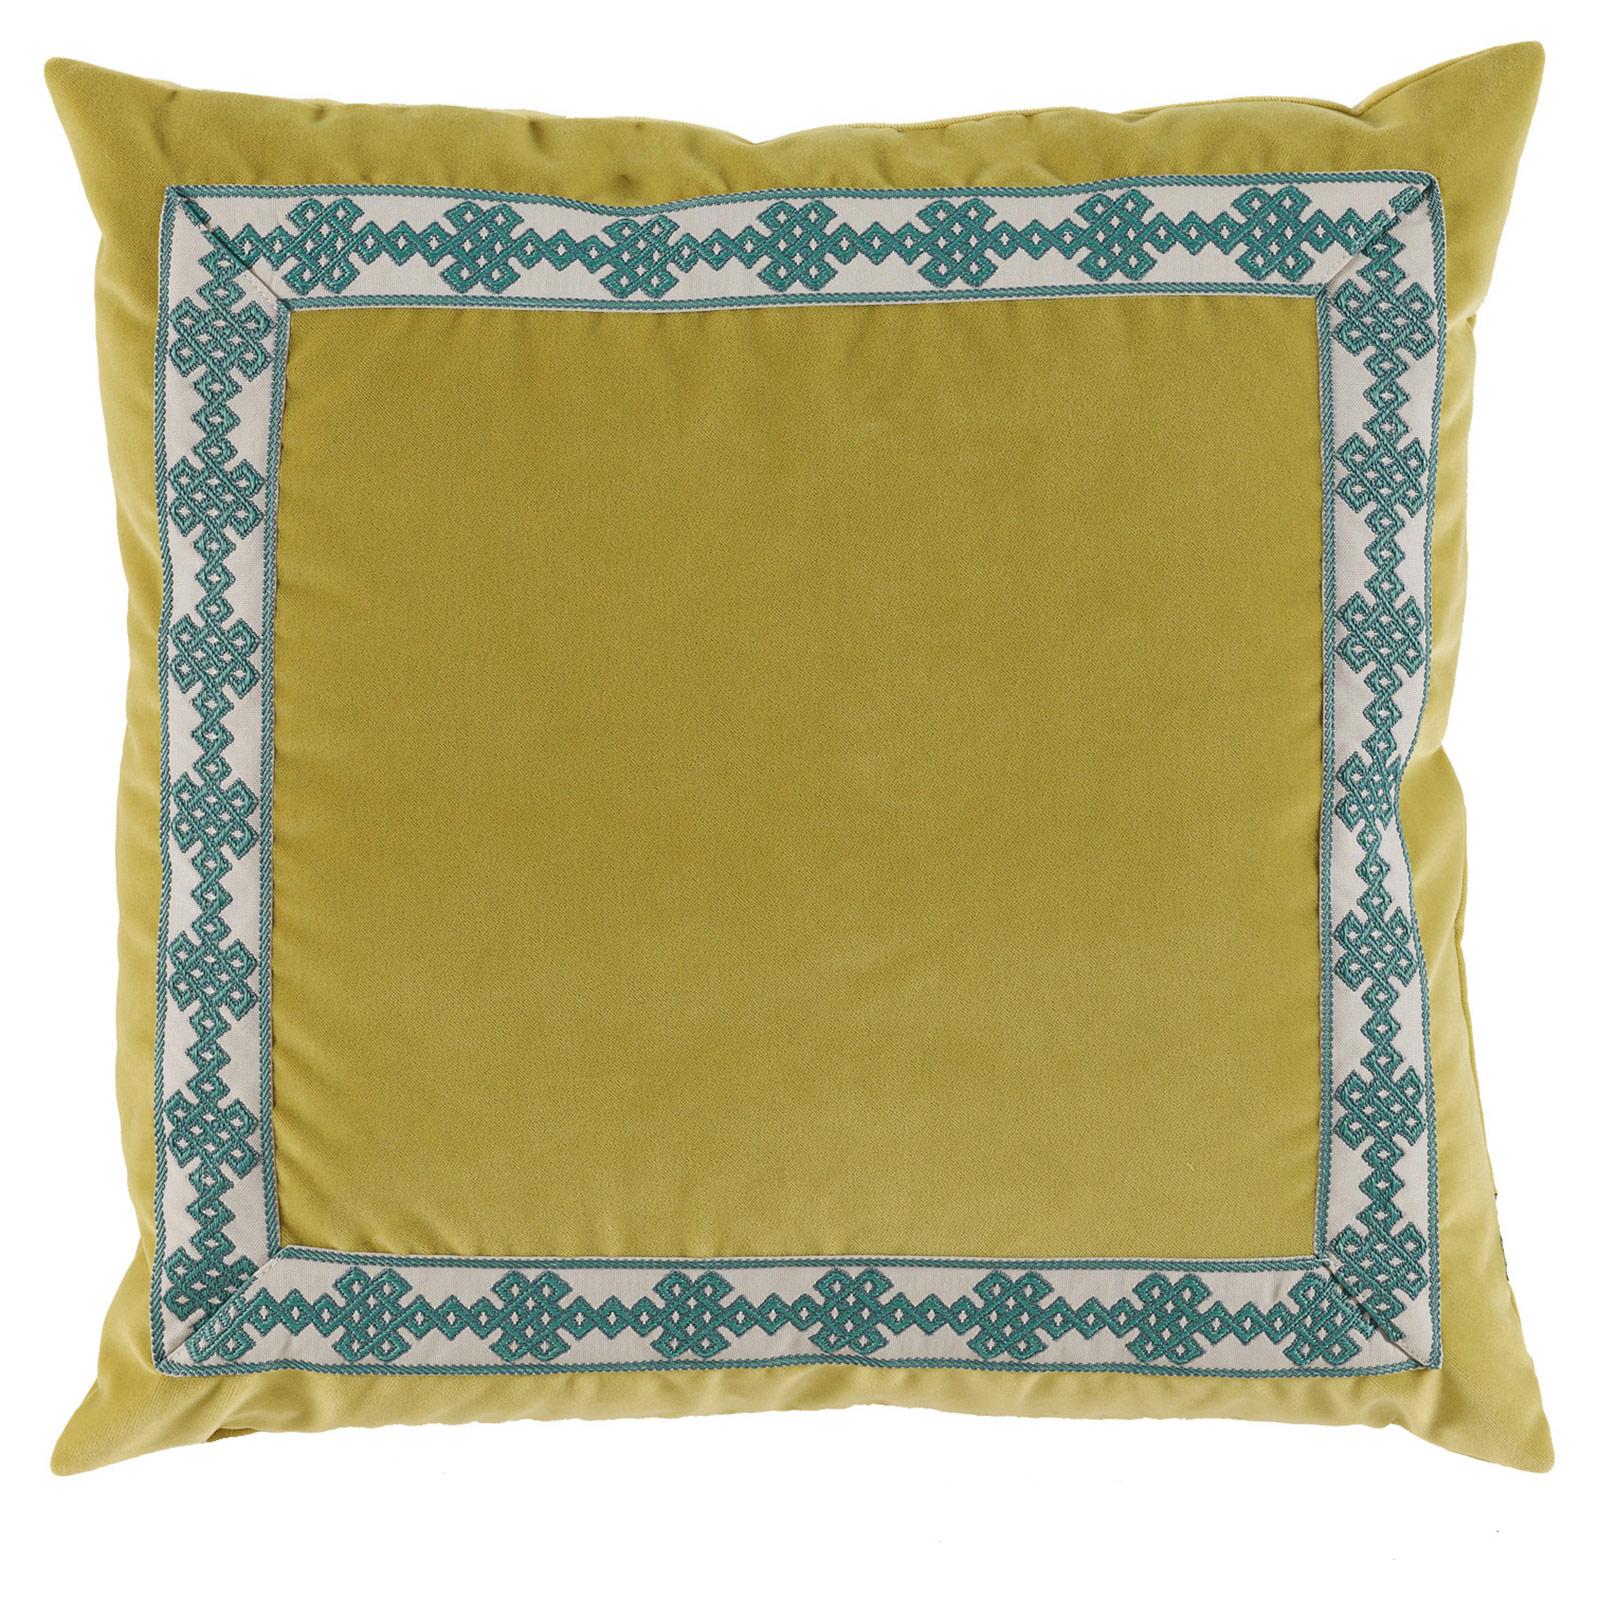 Aida Global Modern Citrus Trellis Trim Velvet Pillow - 22x22